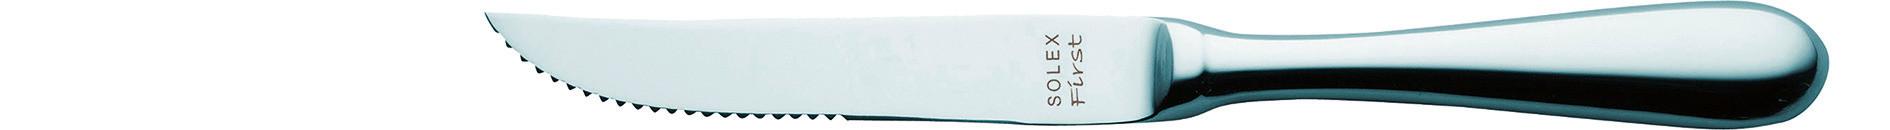 Baguette, Steakmesser Hohlheft 235 mm